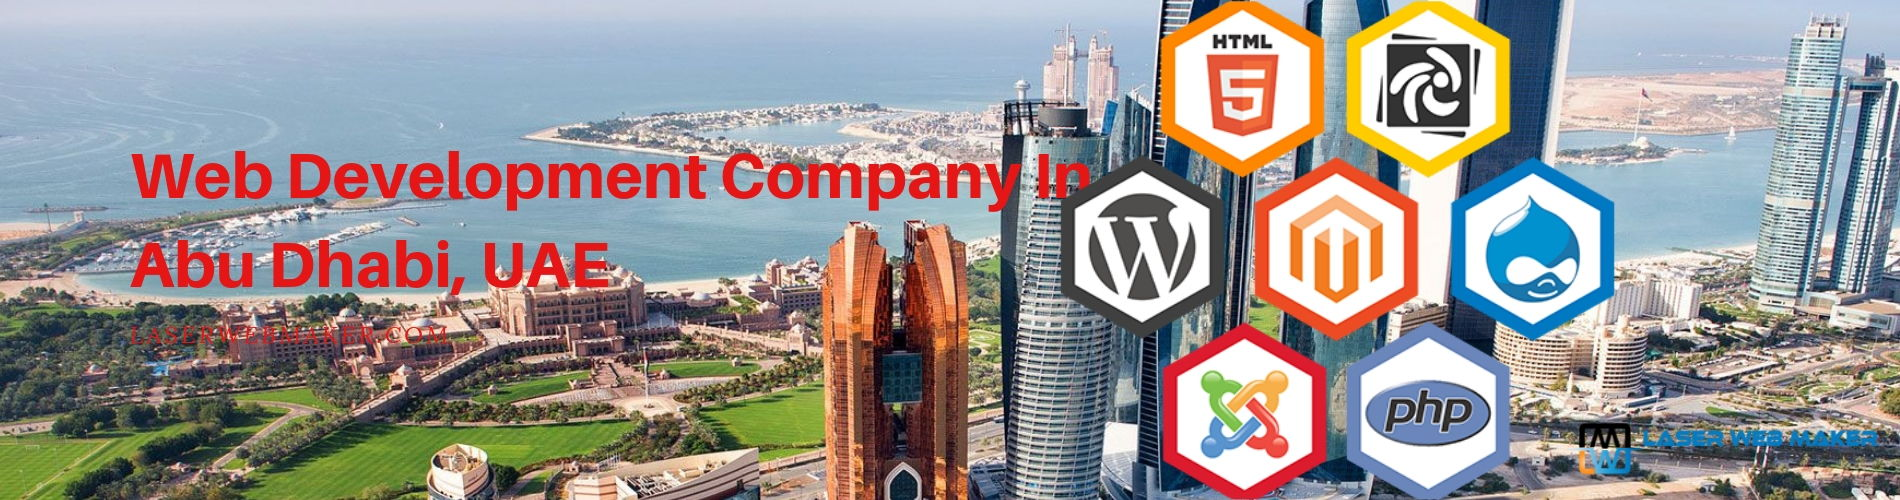 web development company in abu dhabi UAE